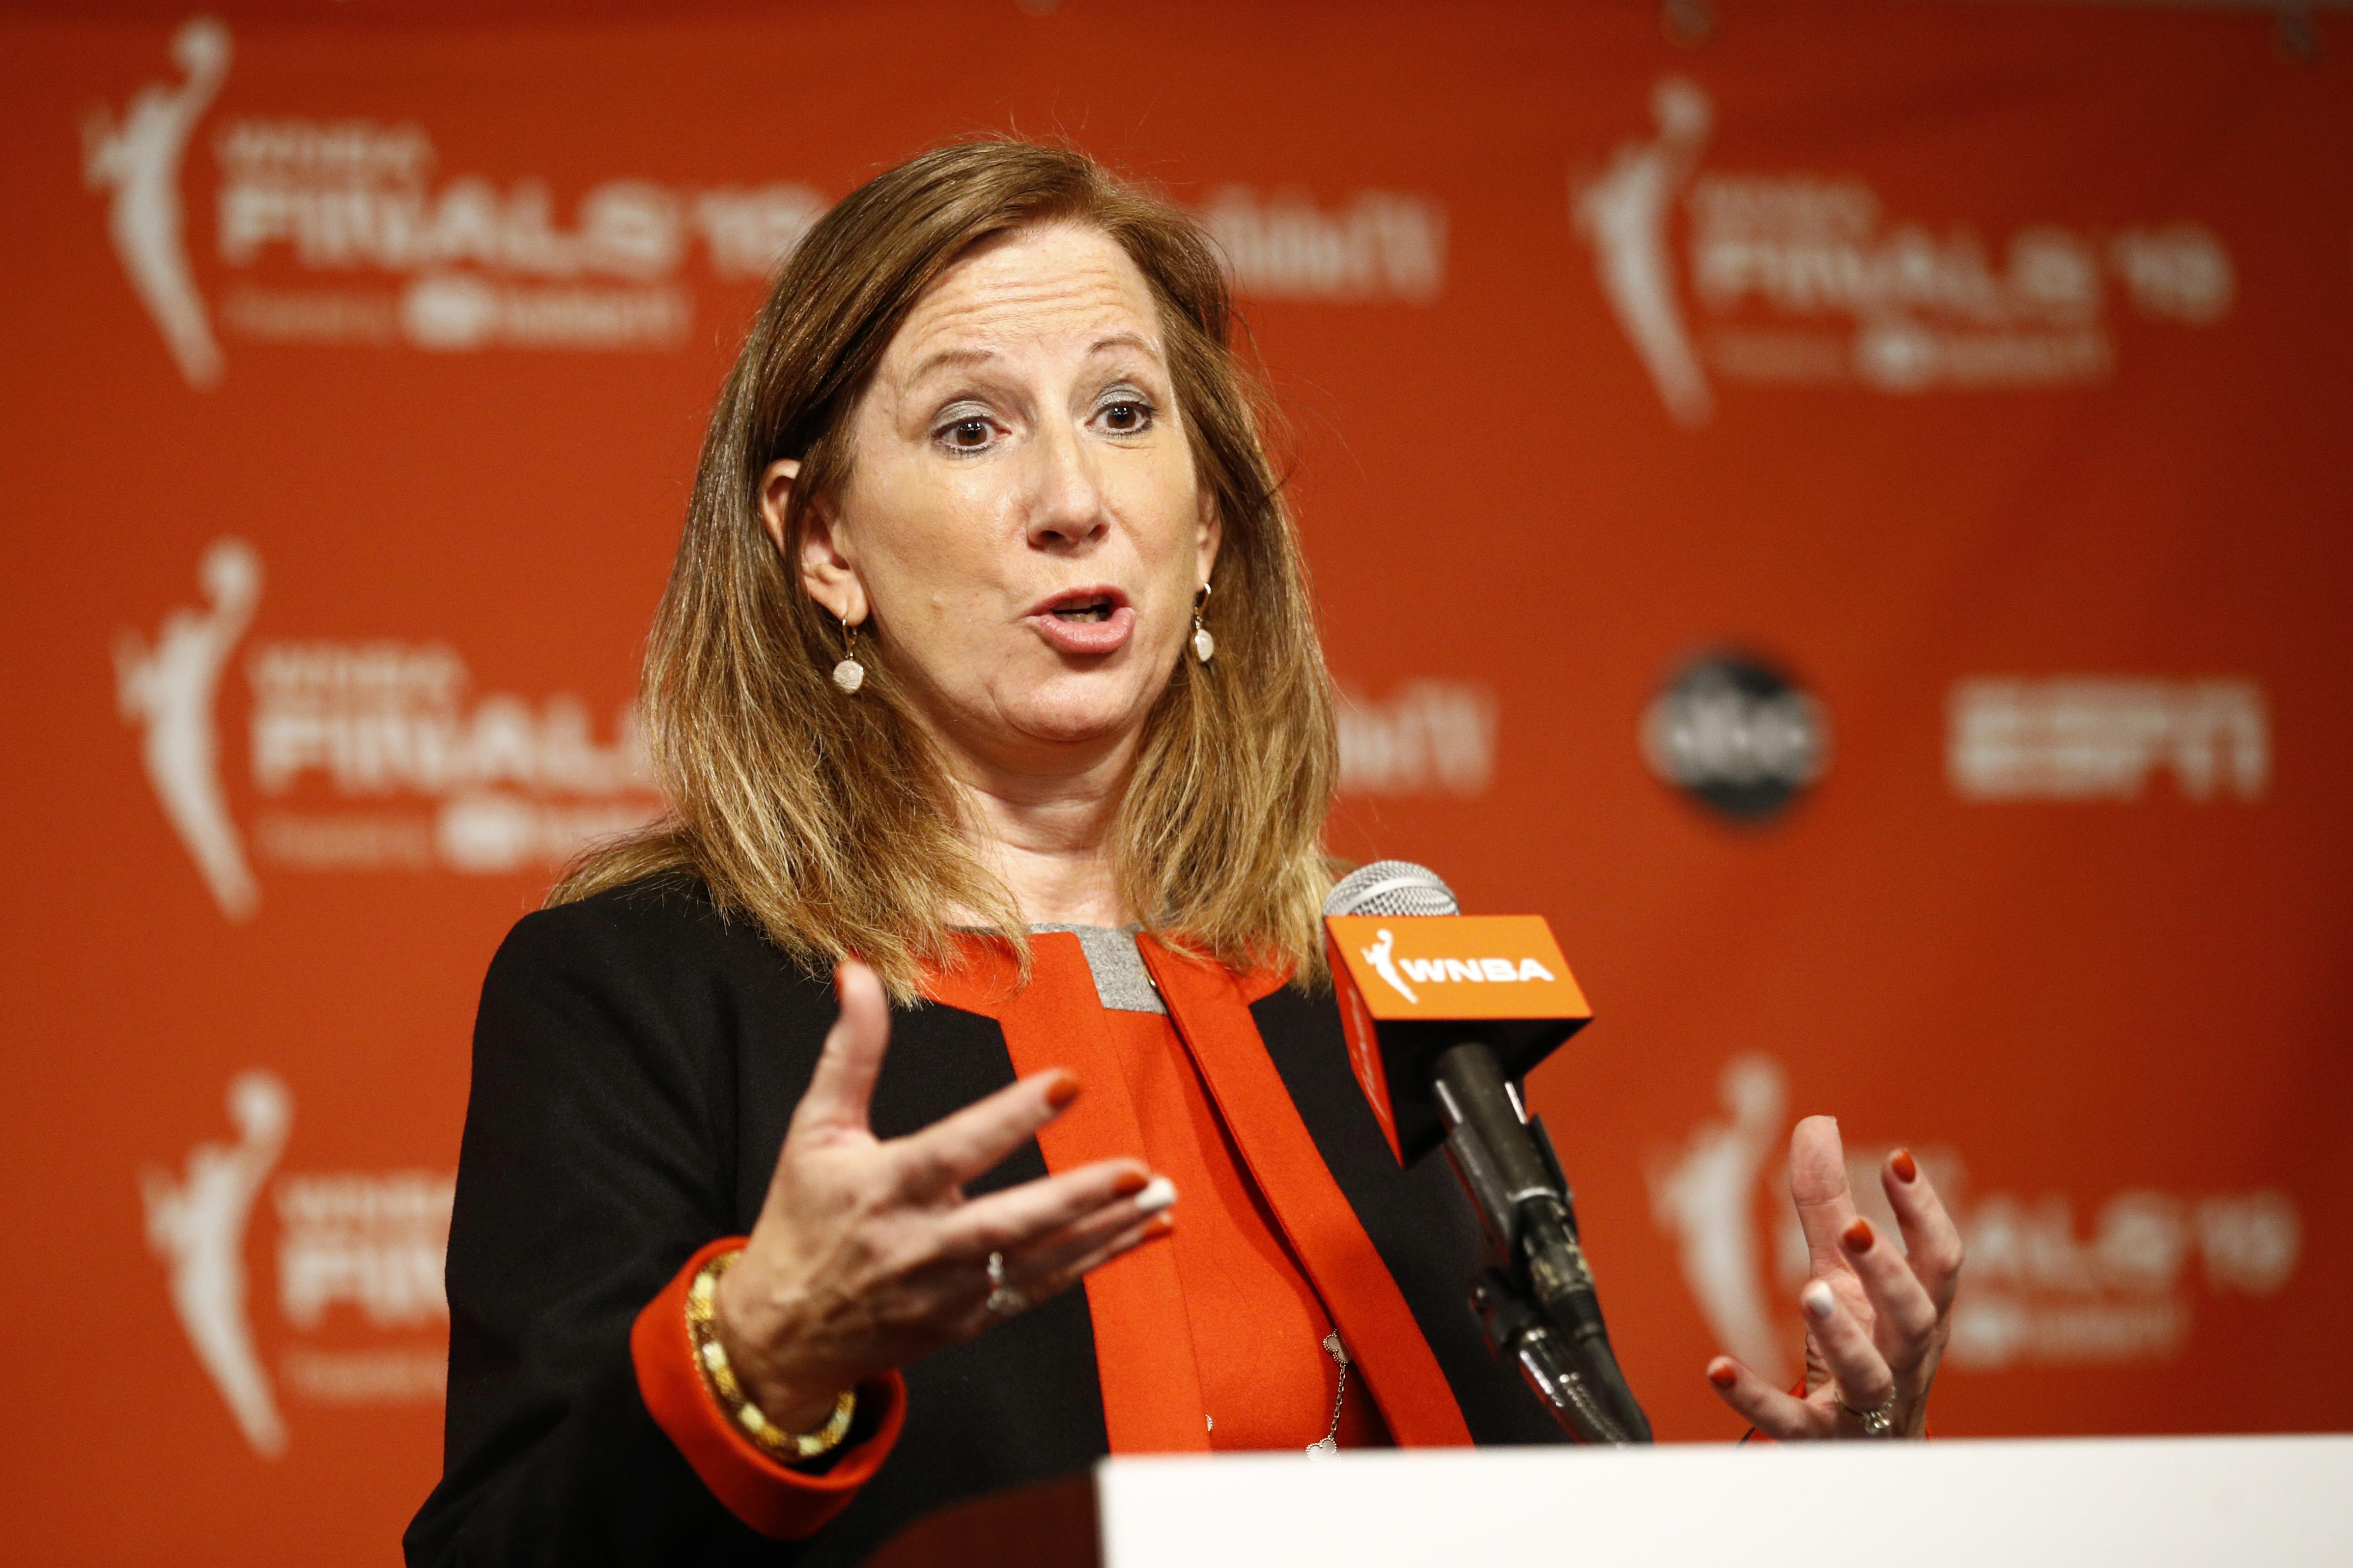 Amid coronavirus, WNBA will hold a 'virtual' draft over video